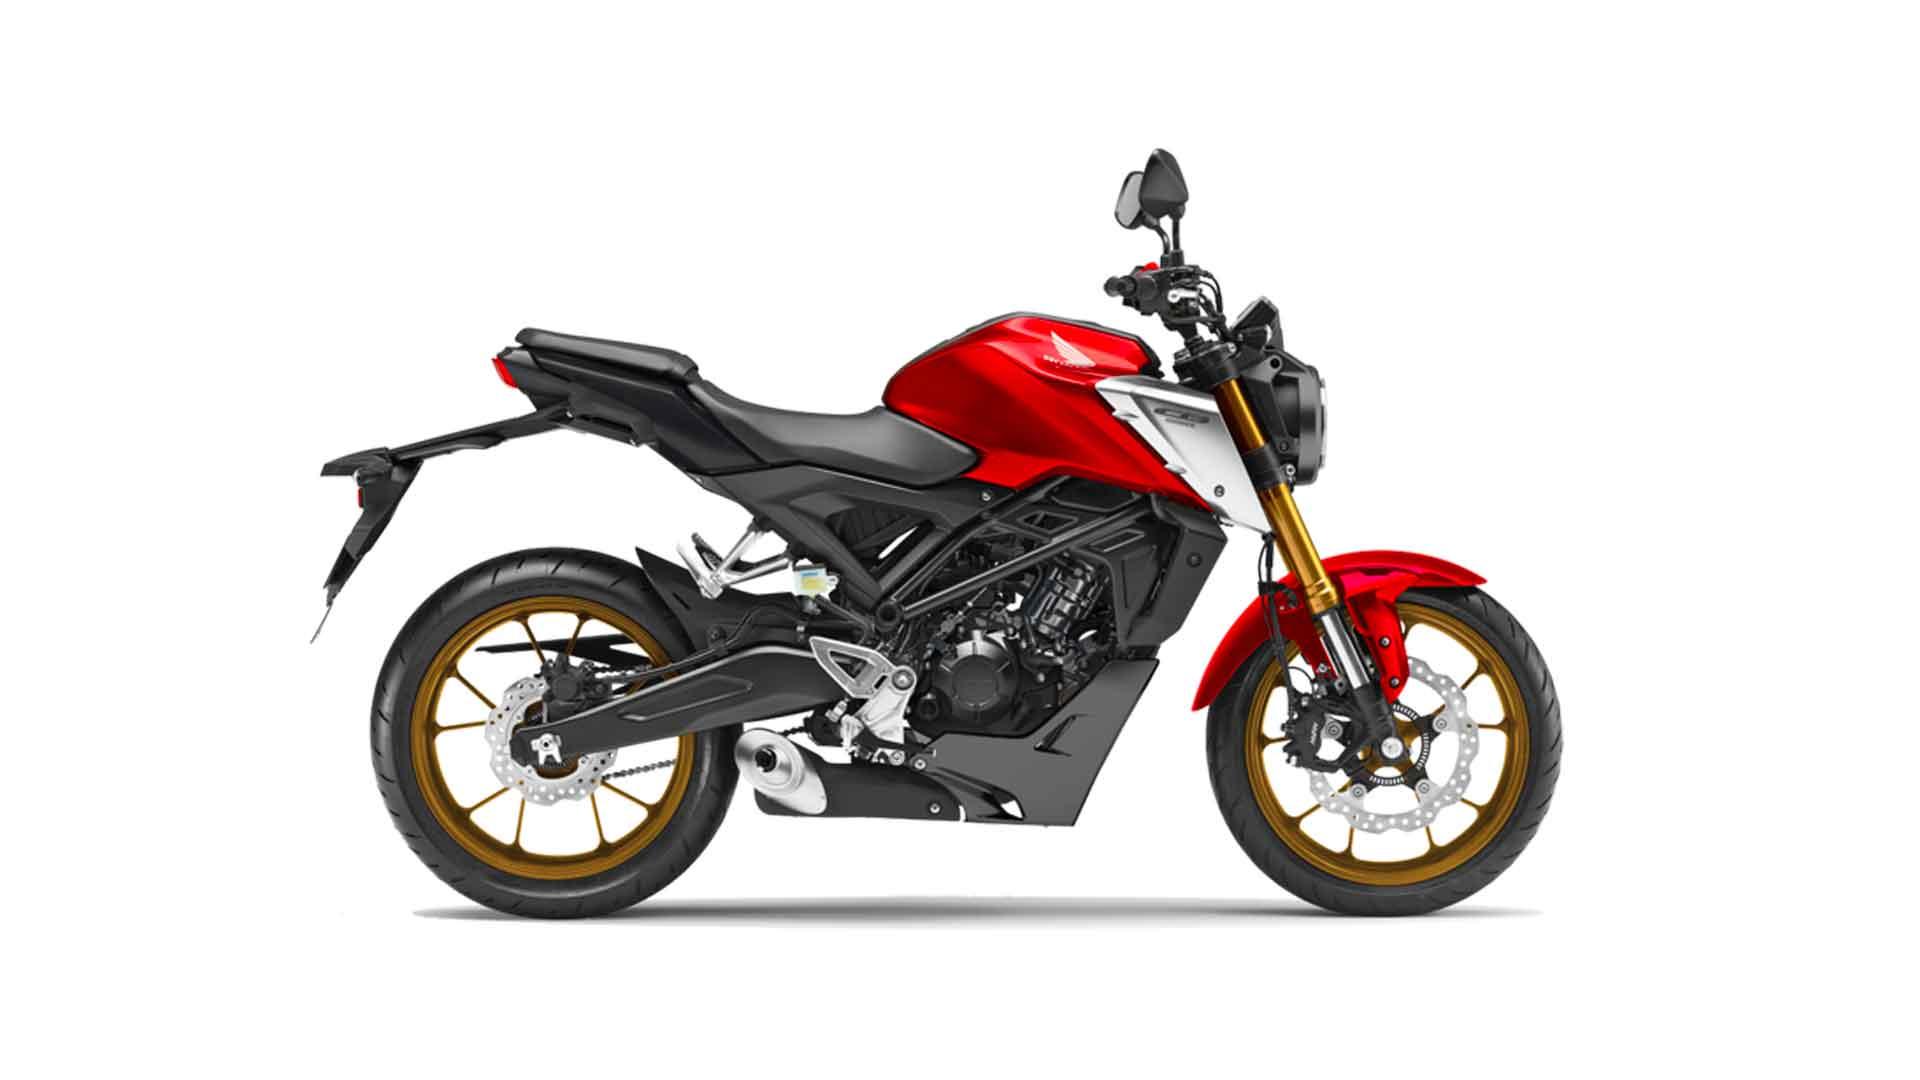 Honda CB125R Price in Bangladesh 2021